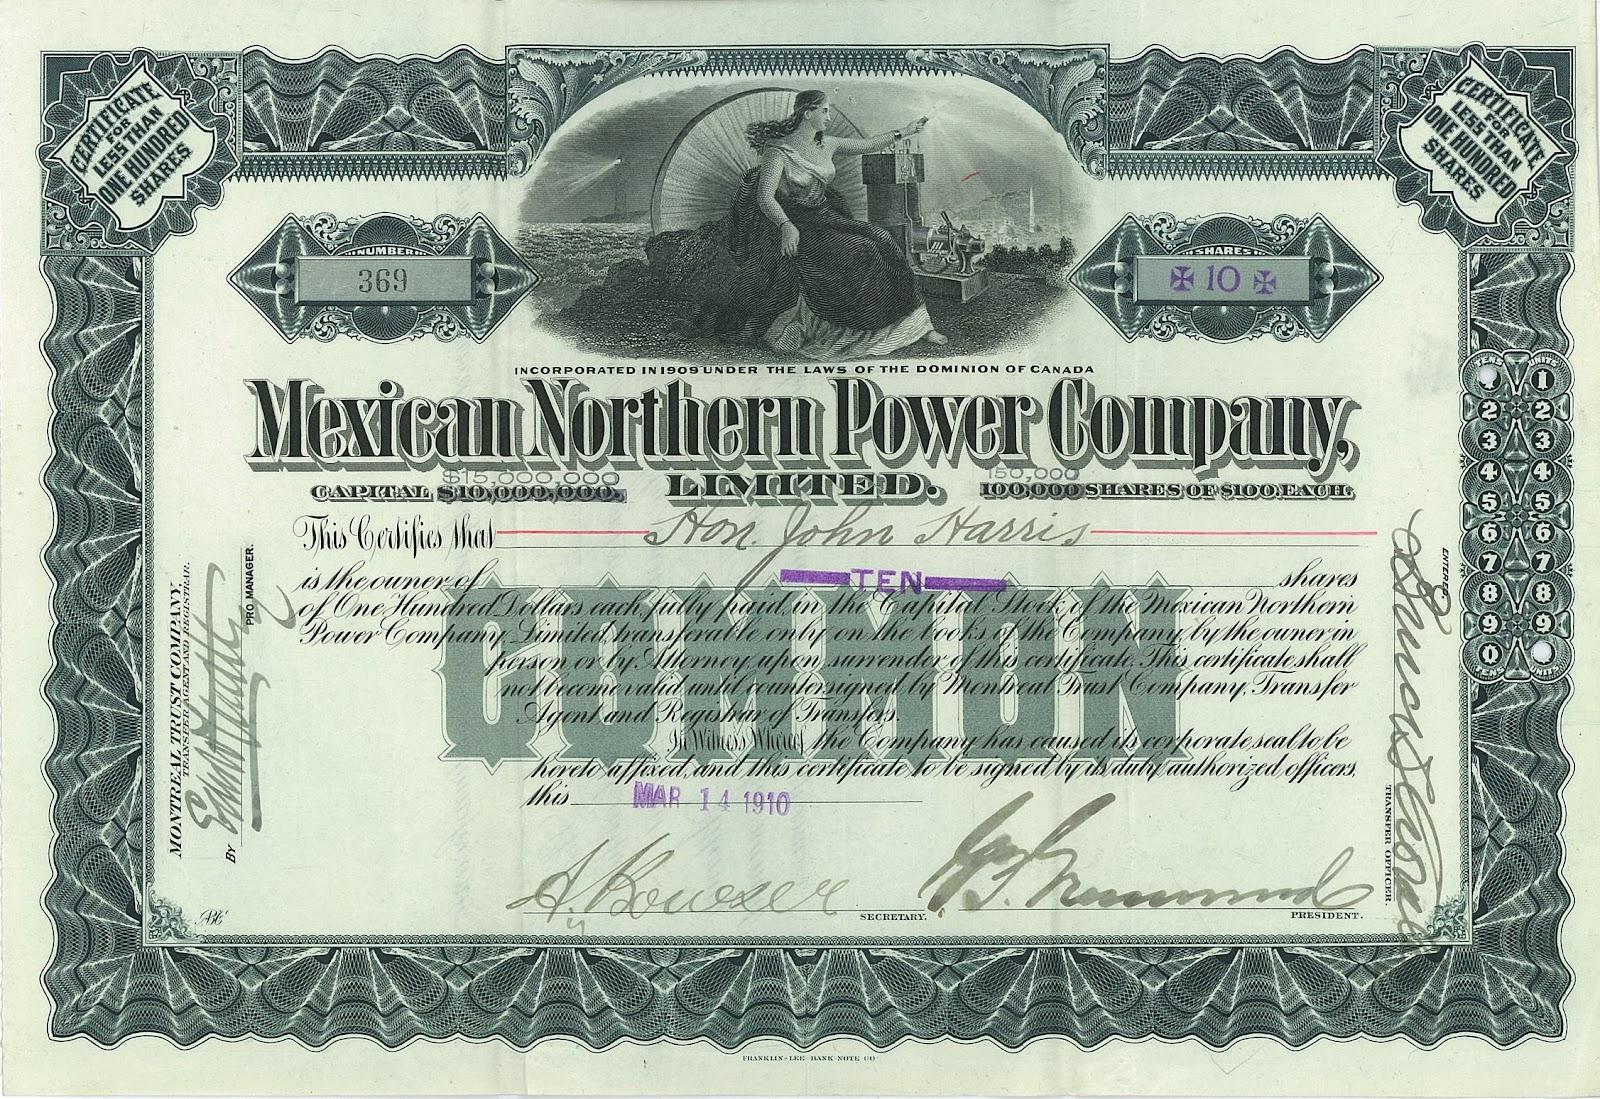 Mexico Northern 369 - 015.jpg